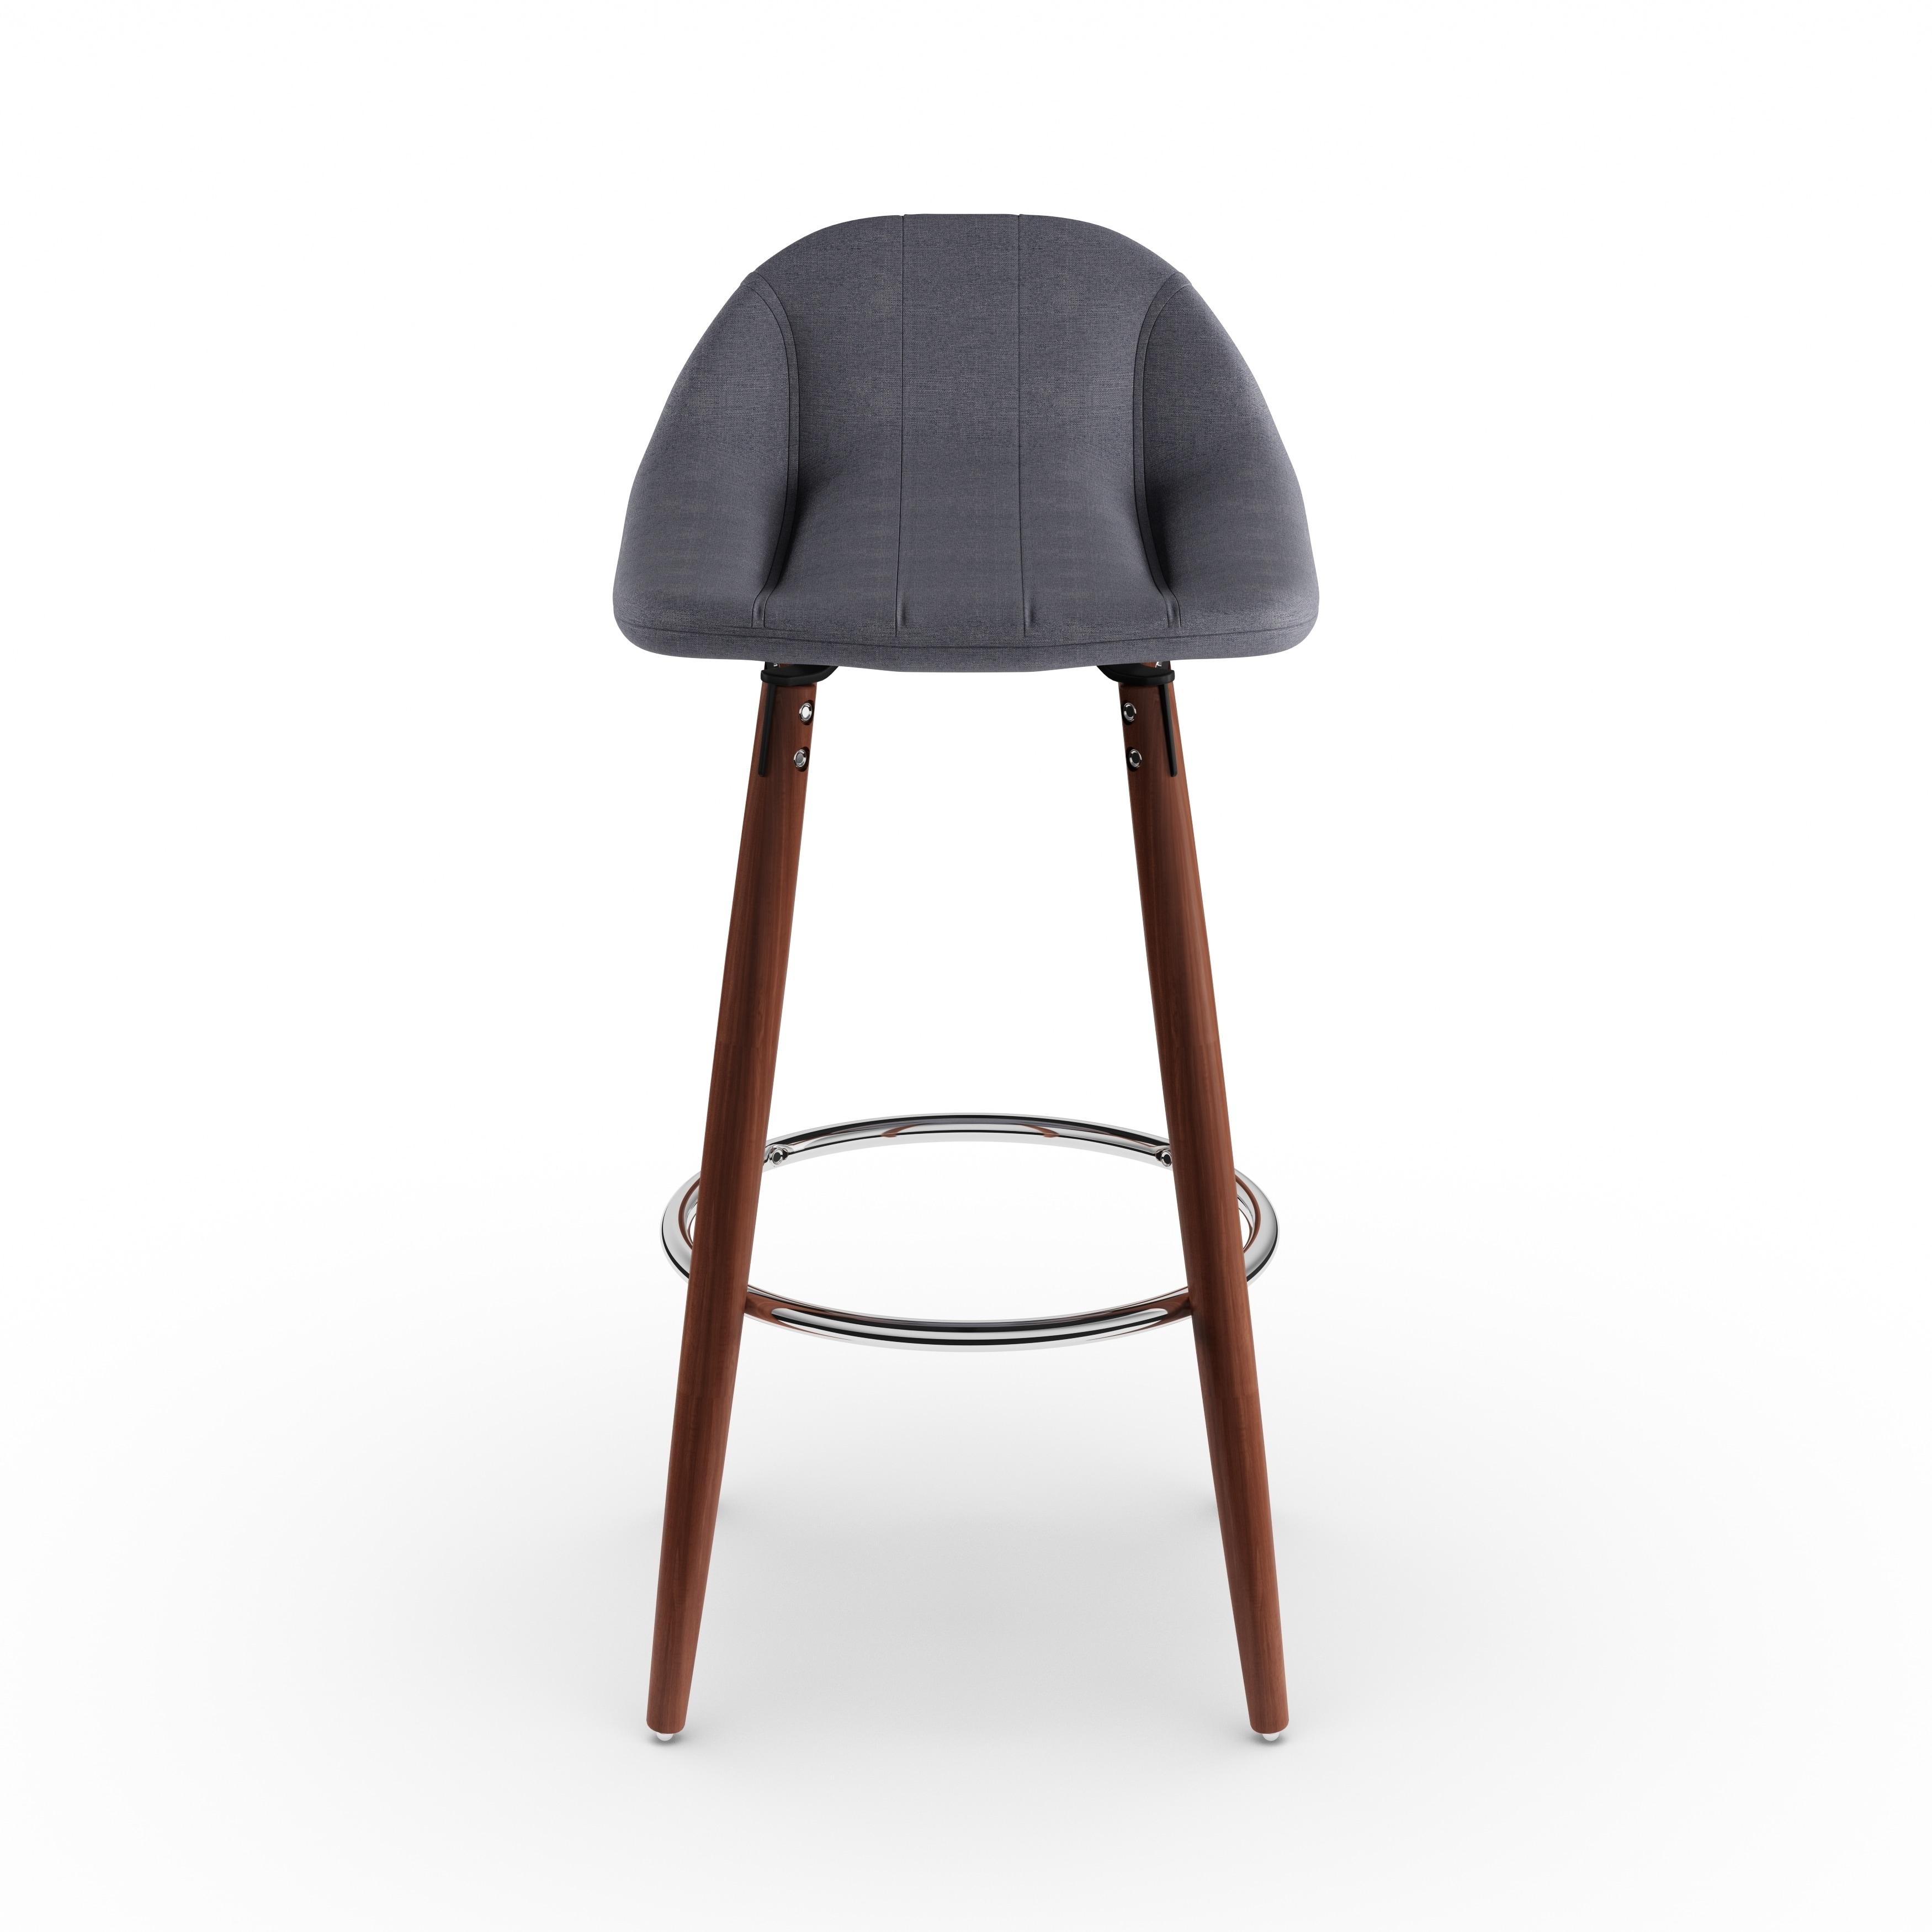 Outstanding Carson Carrington Hauganes 26 Inch Counter Stool Set Of 2 Evergreenethics Interior Chair Design Evergreenethicsorg